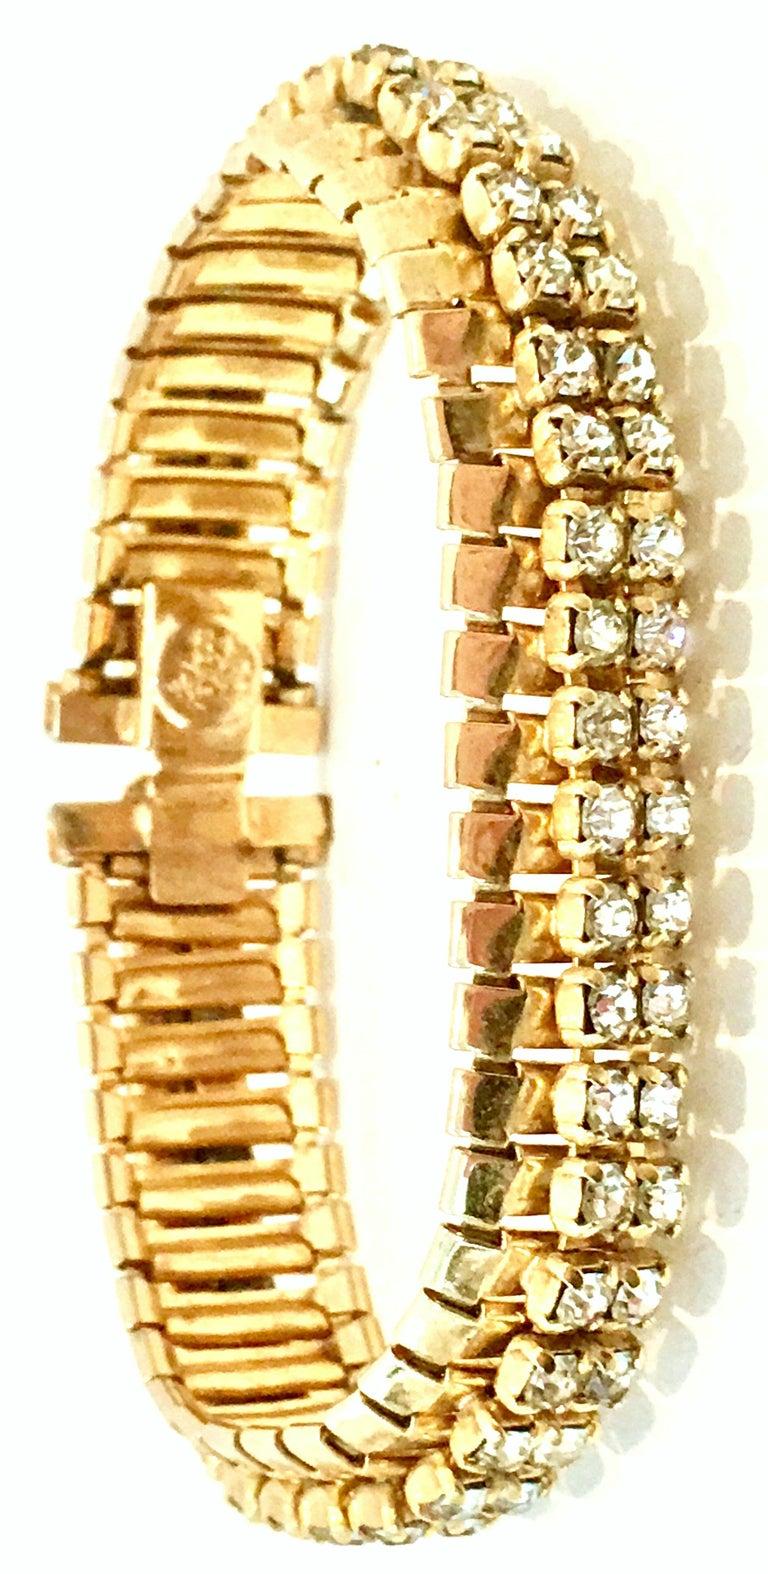 1950'S Gol & Swarovski Crystal Rhinestone Link Bracelet By, Jewels By Julio In Good Condition For Sale In West Palm Beach, FL